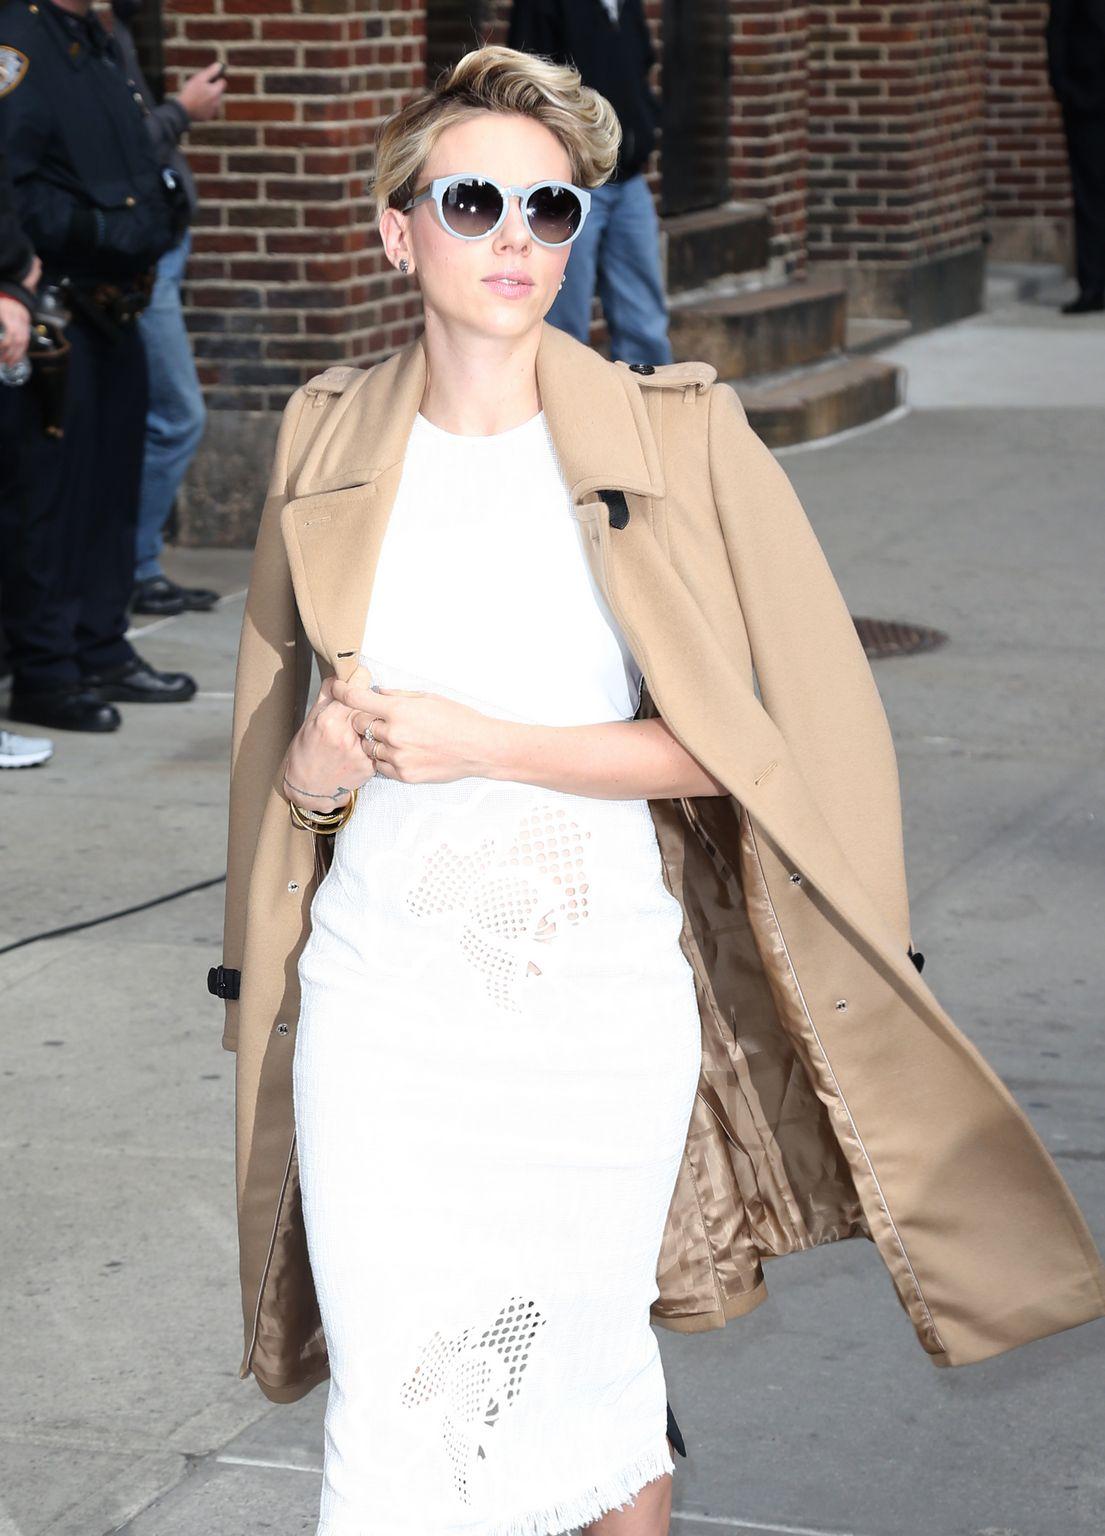 Scarlett Johansson At David Letterman Show-3